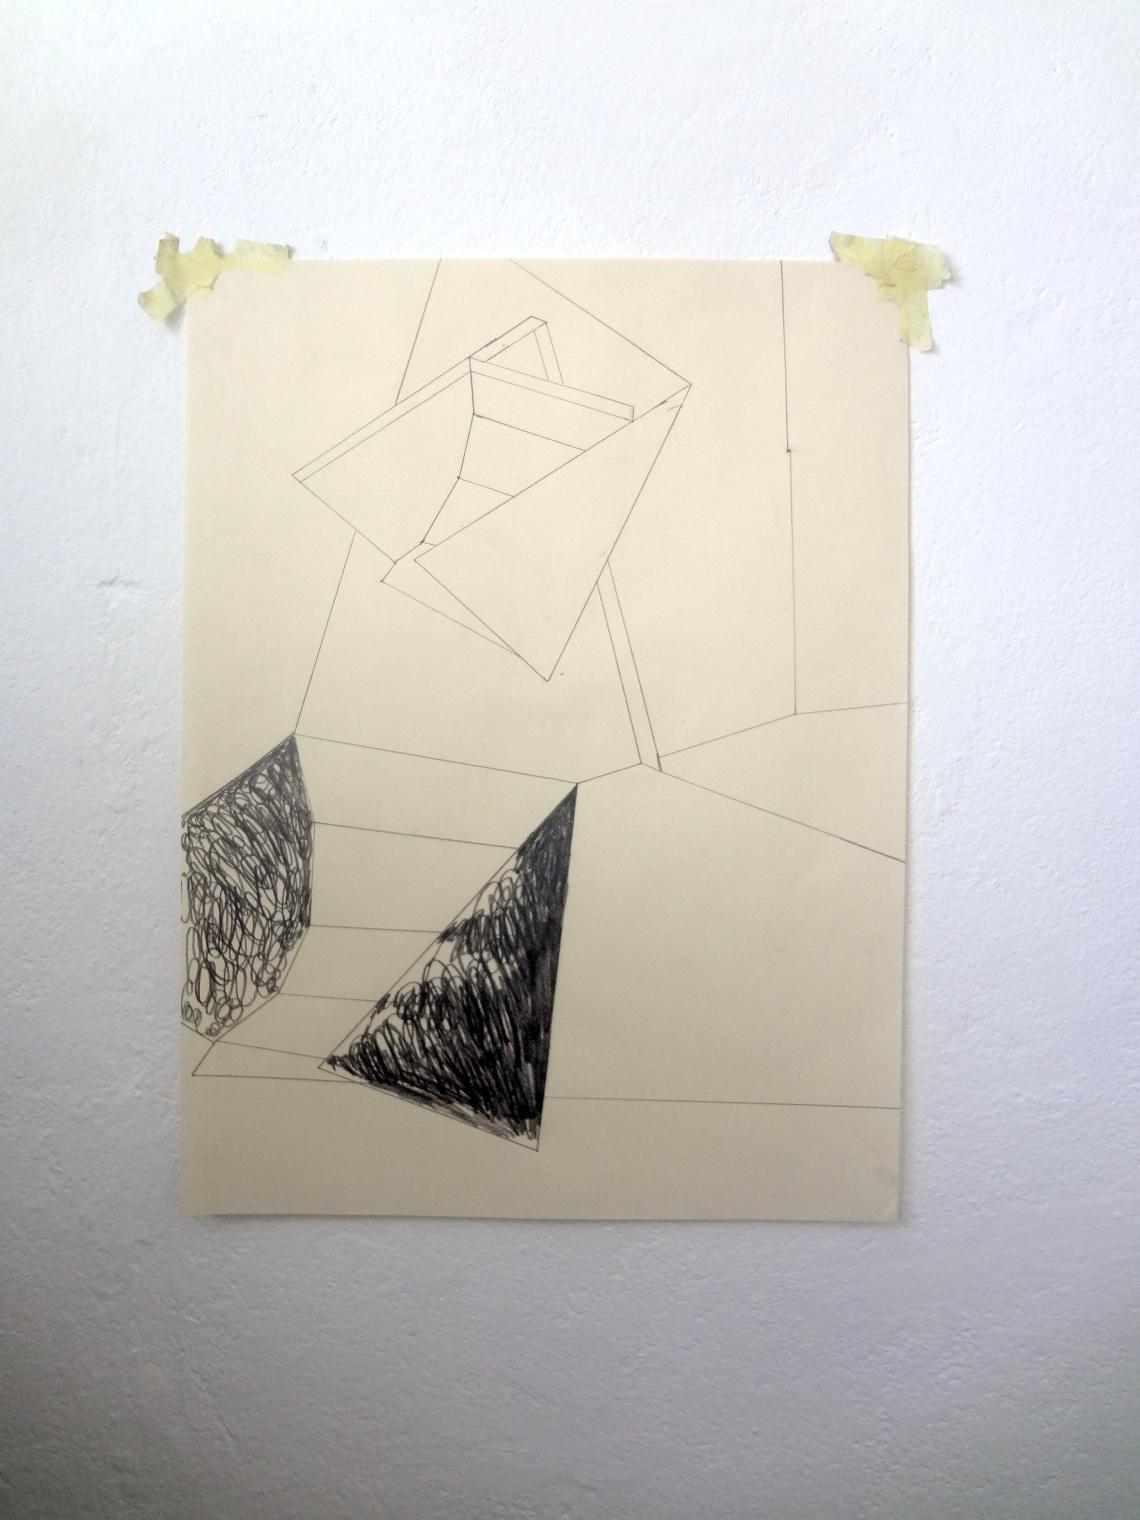 drawingmirjamkroker2015